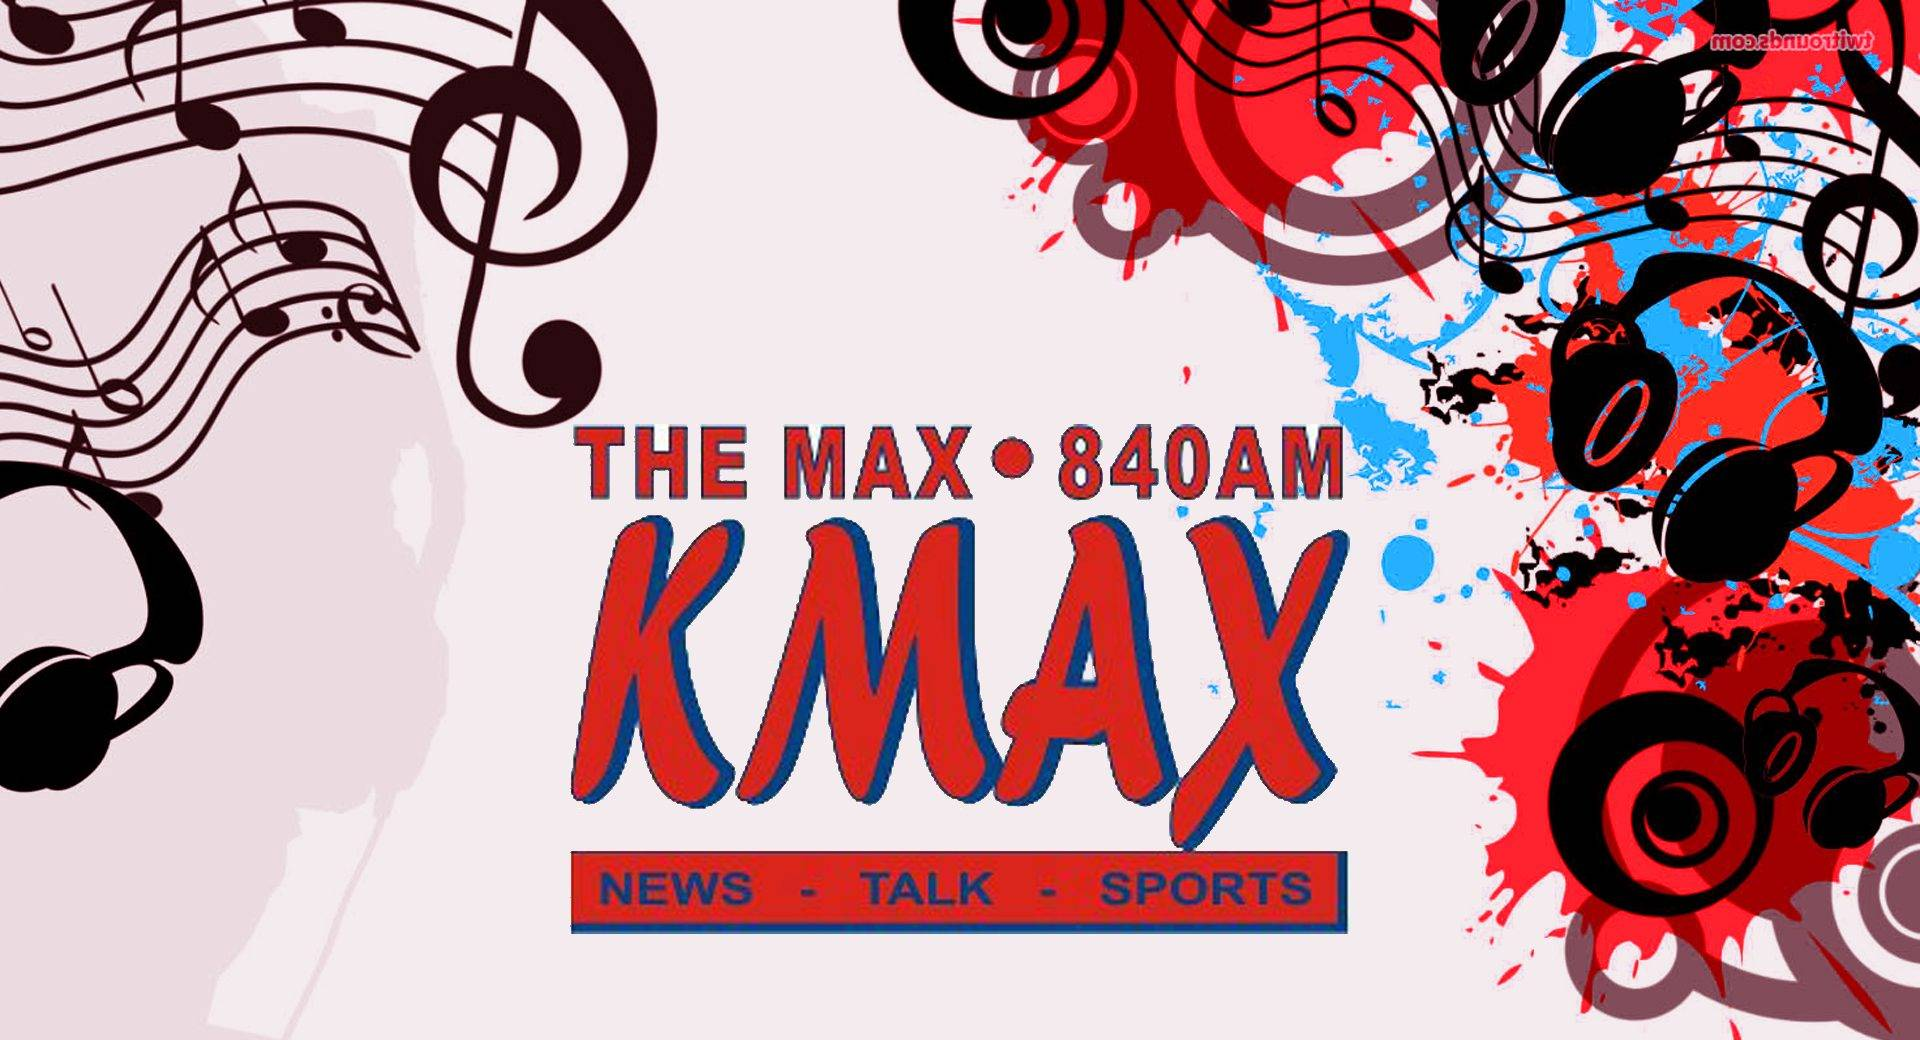 KMAX AM Radio